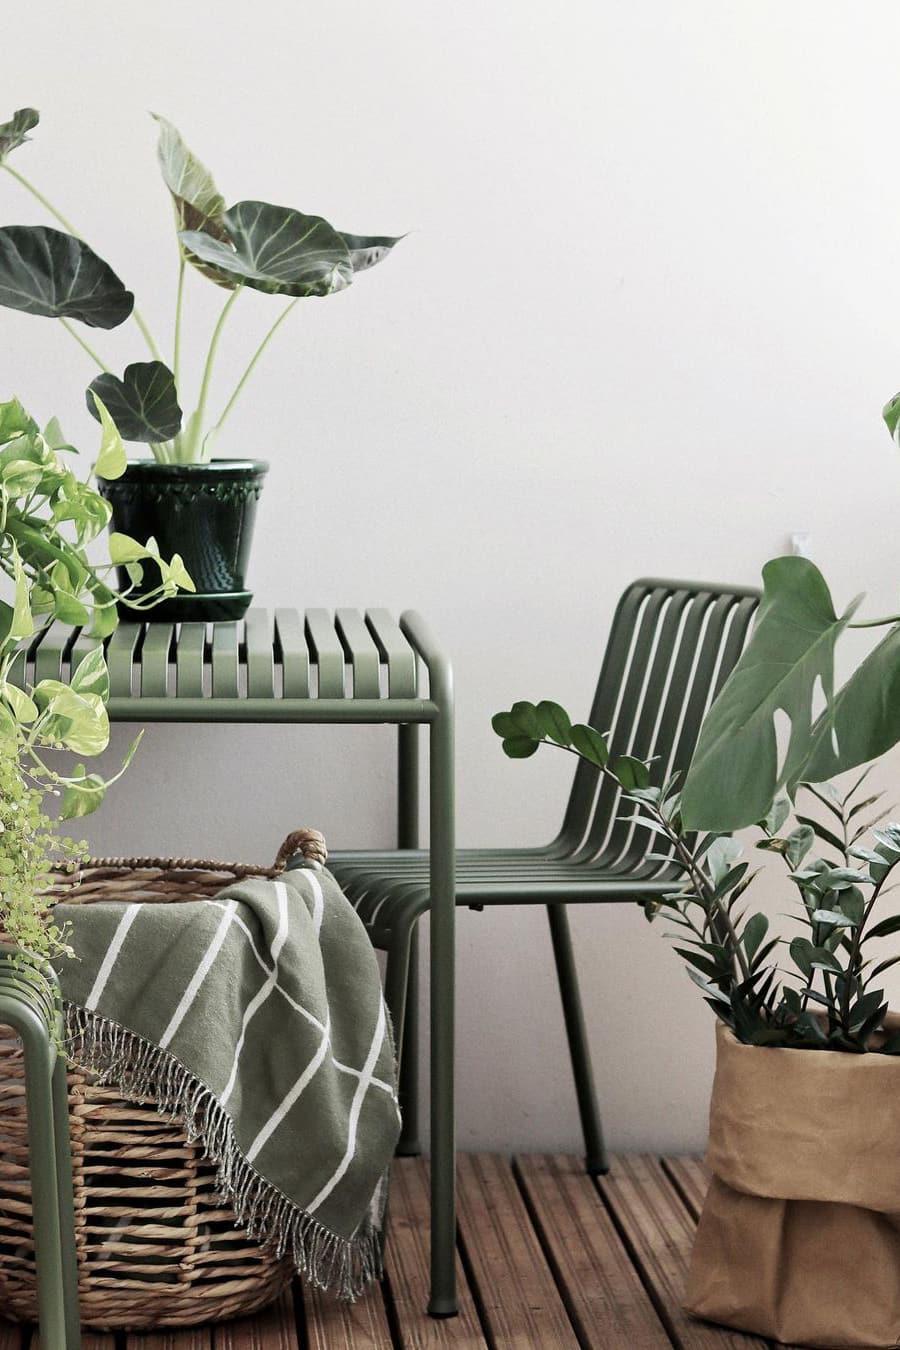 Minimalist small balcony furniture